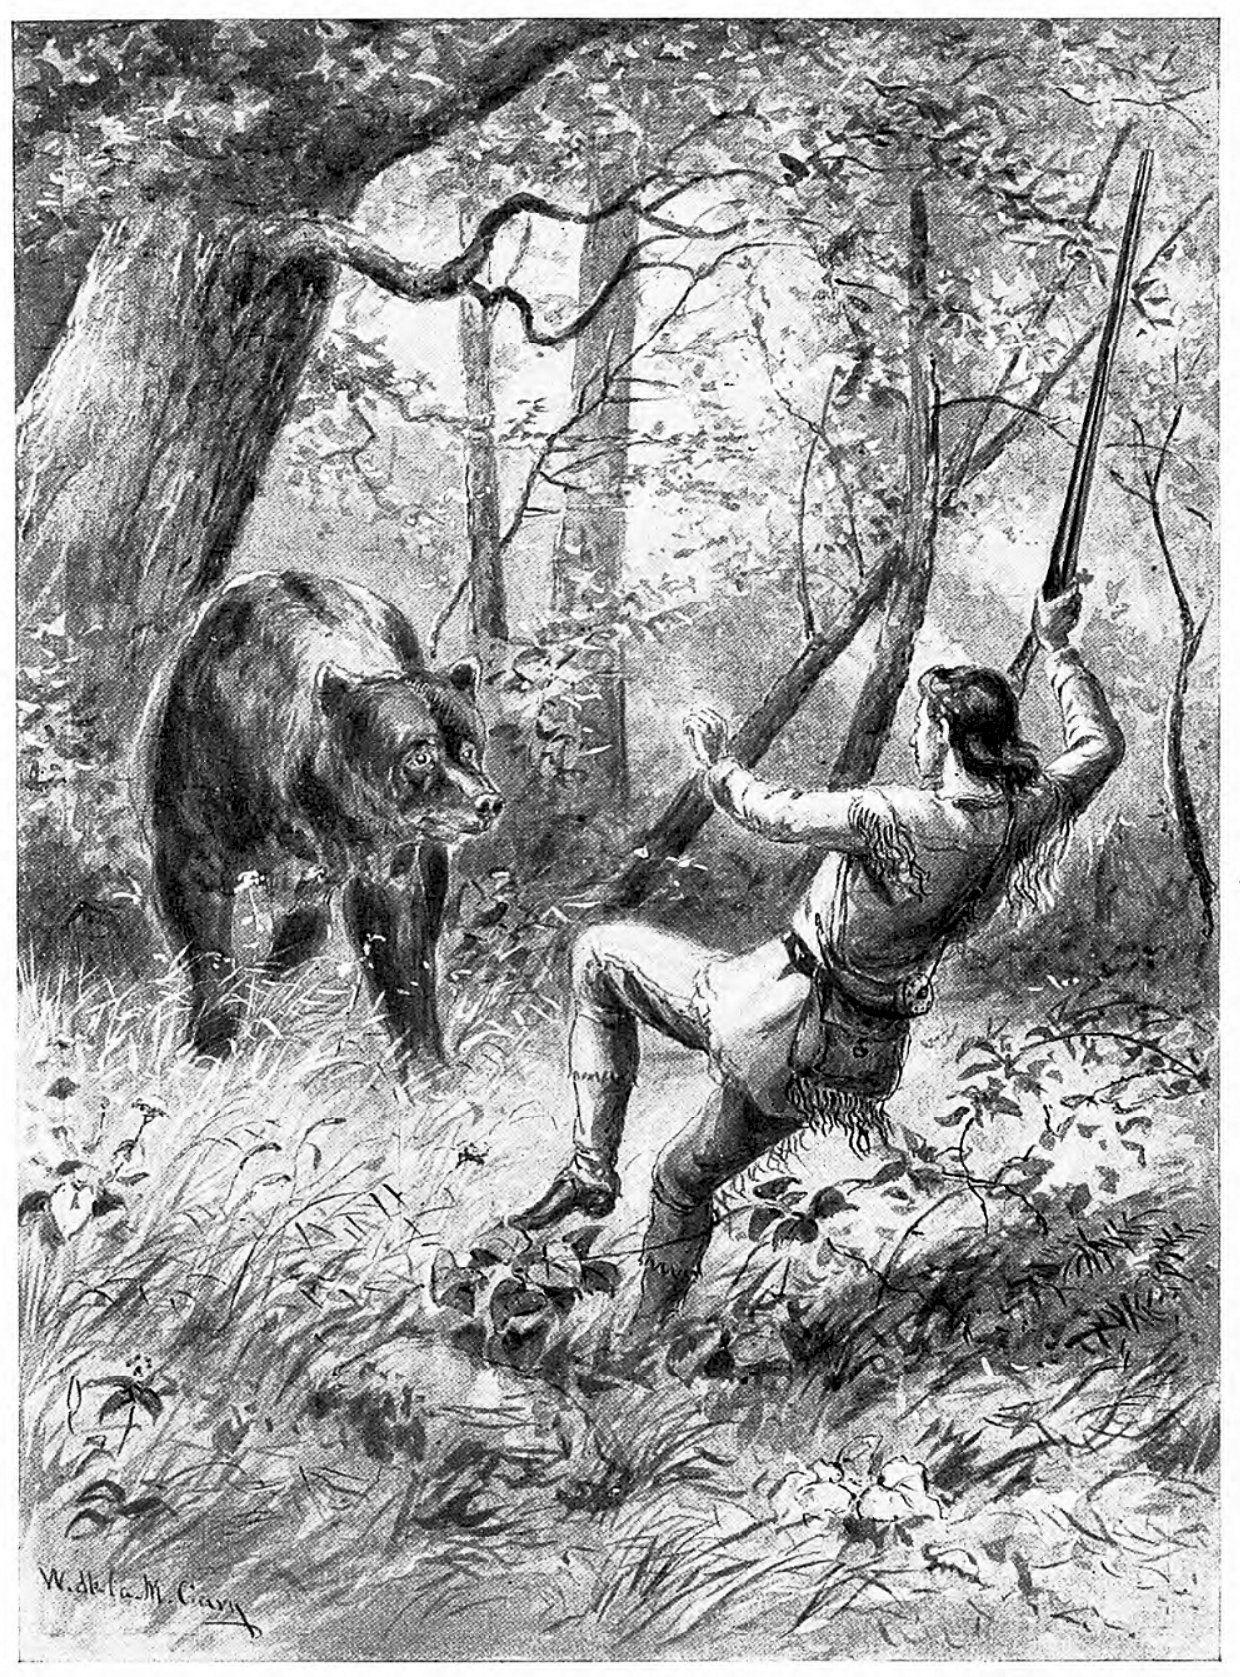 Animal wild bear attacking a man hunter in woods